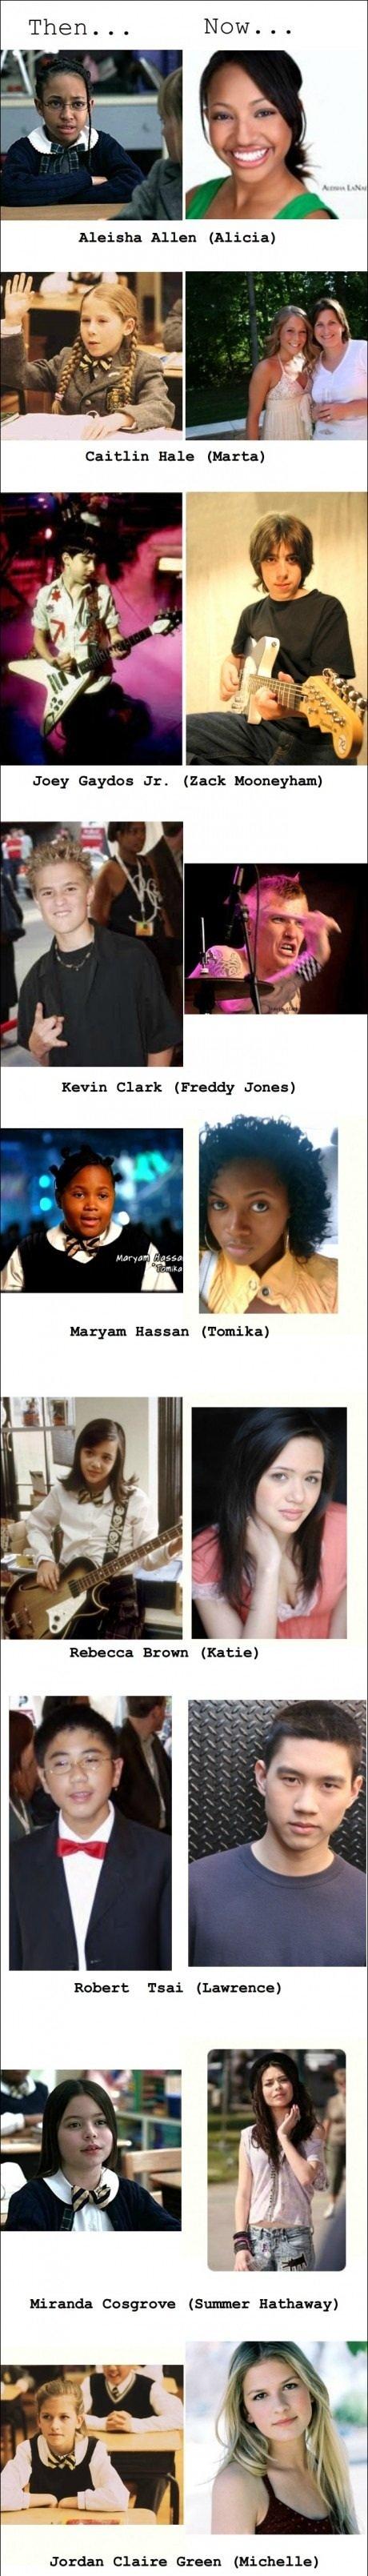 School of Rock cast then and now. . Caitlin Hale {Marta} Joey Gaydar Jr. {Zack ', Ila Hobart Taar {Lawrence} Jordan Claire Graan [iall, ! t, rt',